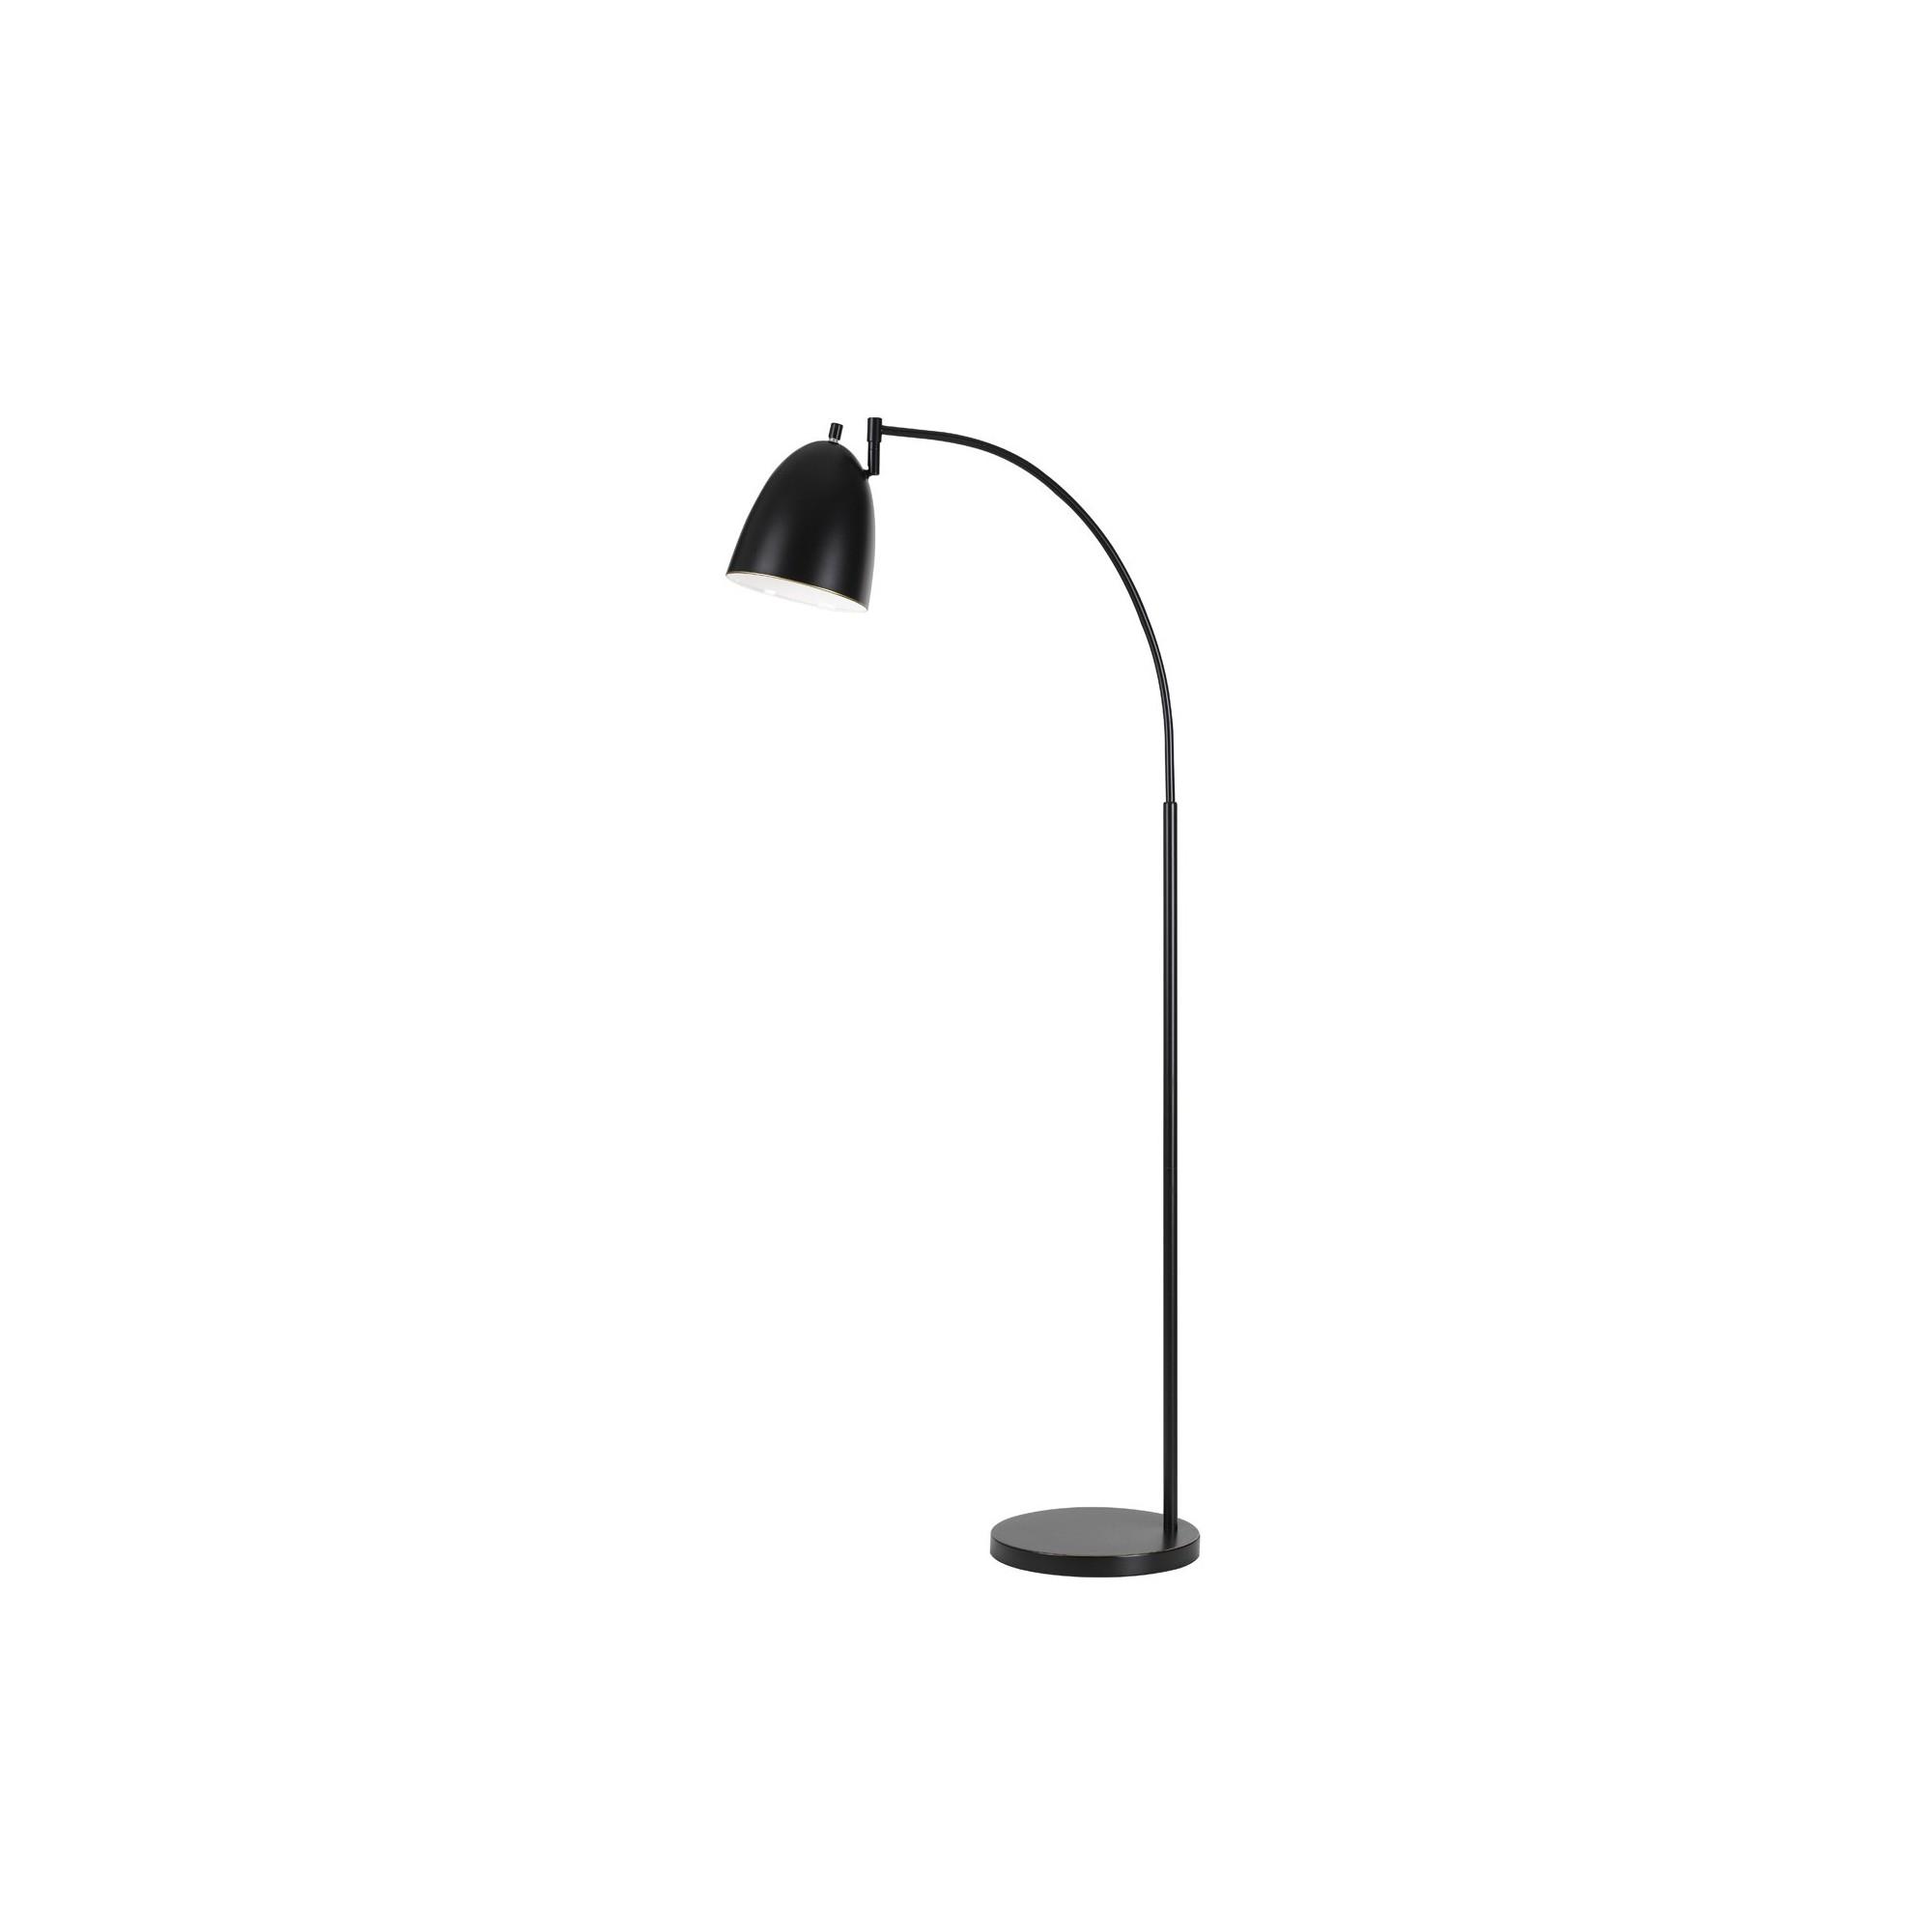 Floor lamp cal lighting floor lamps floor lamp and products floor lamp cal lighting floor lamps mozeypictures Choice Image